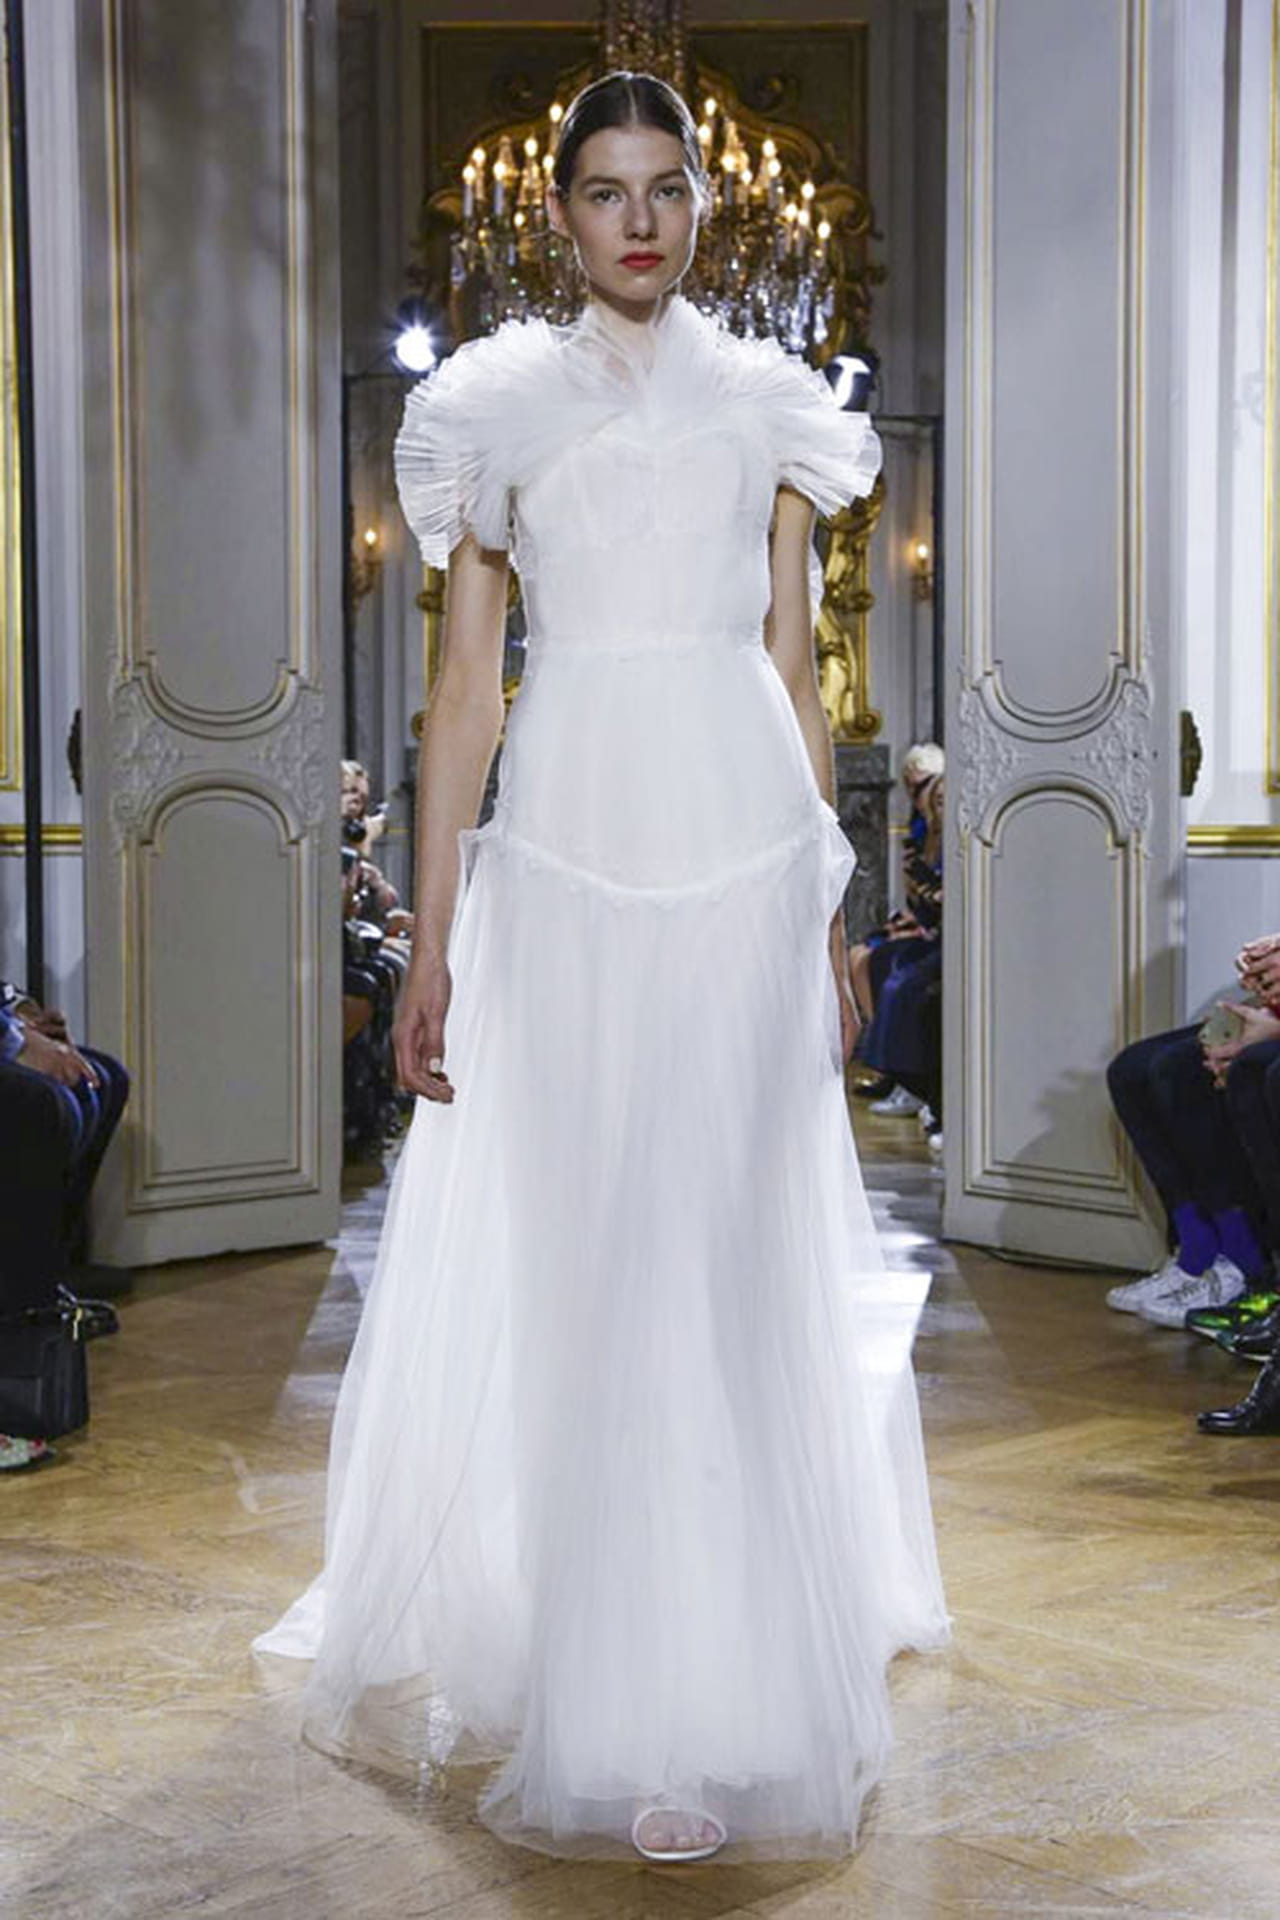 df03643ed3ca5 فساتين زفاف ناعمة من Kaviar Gauche لعروس الربيع